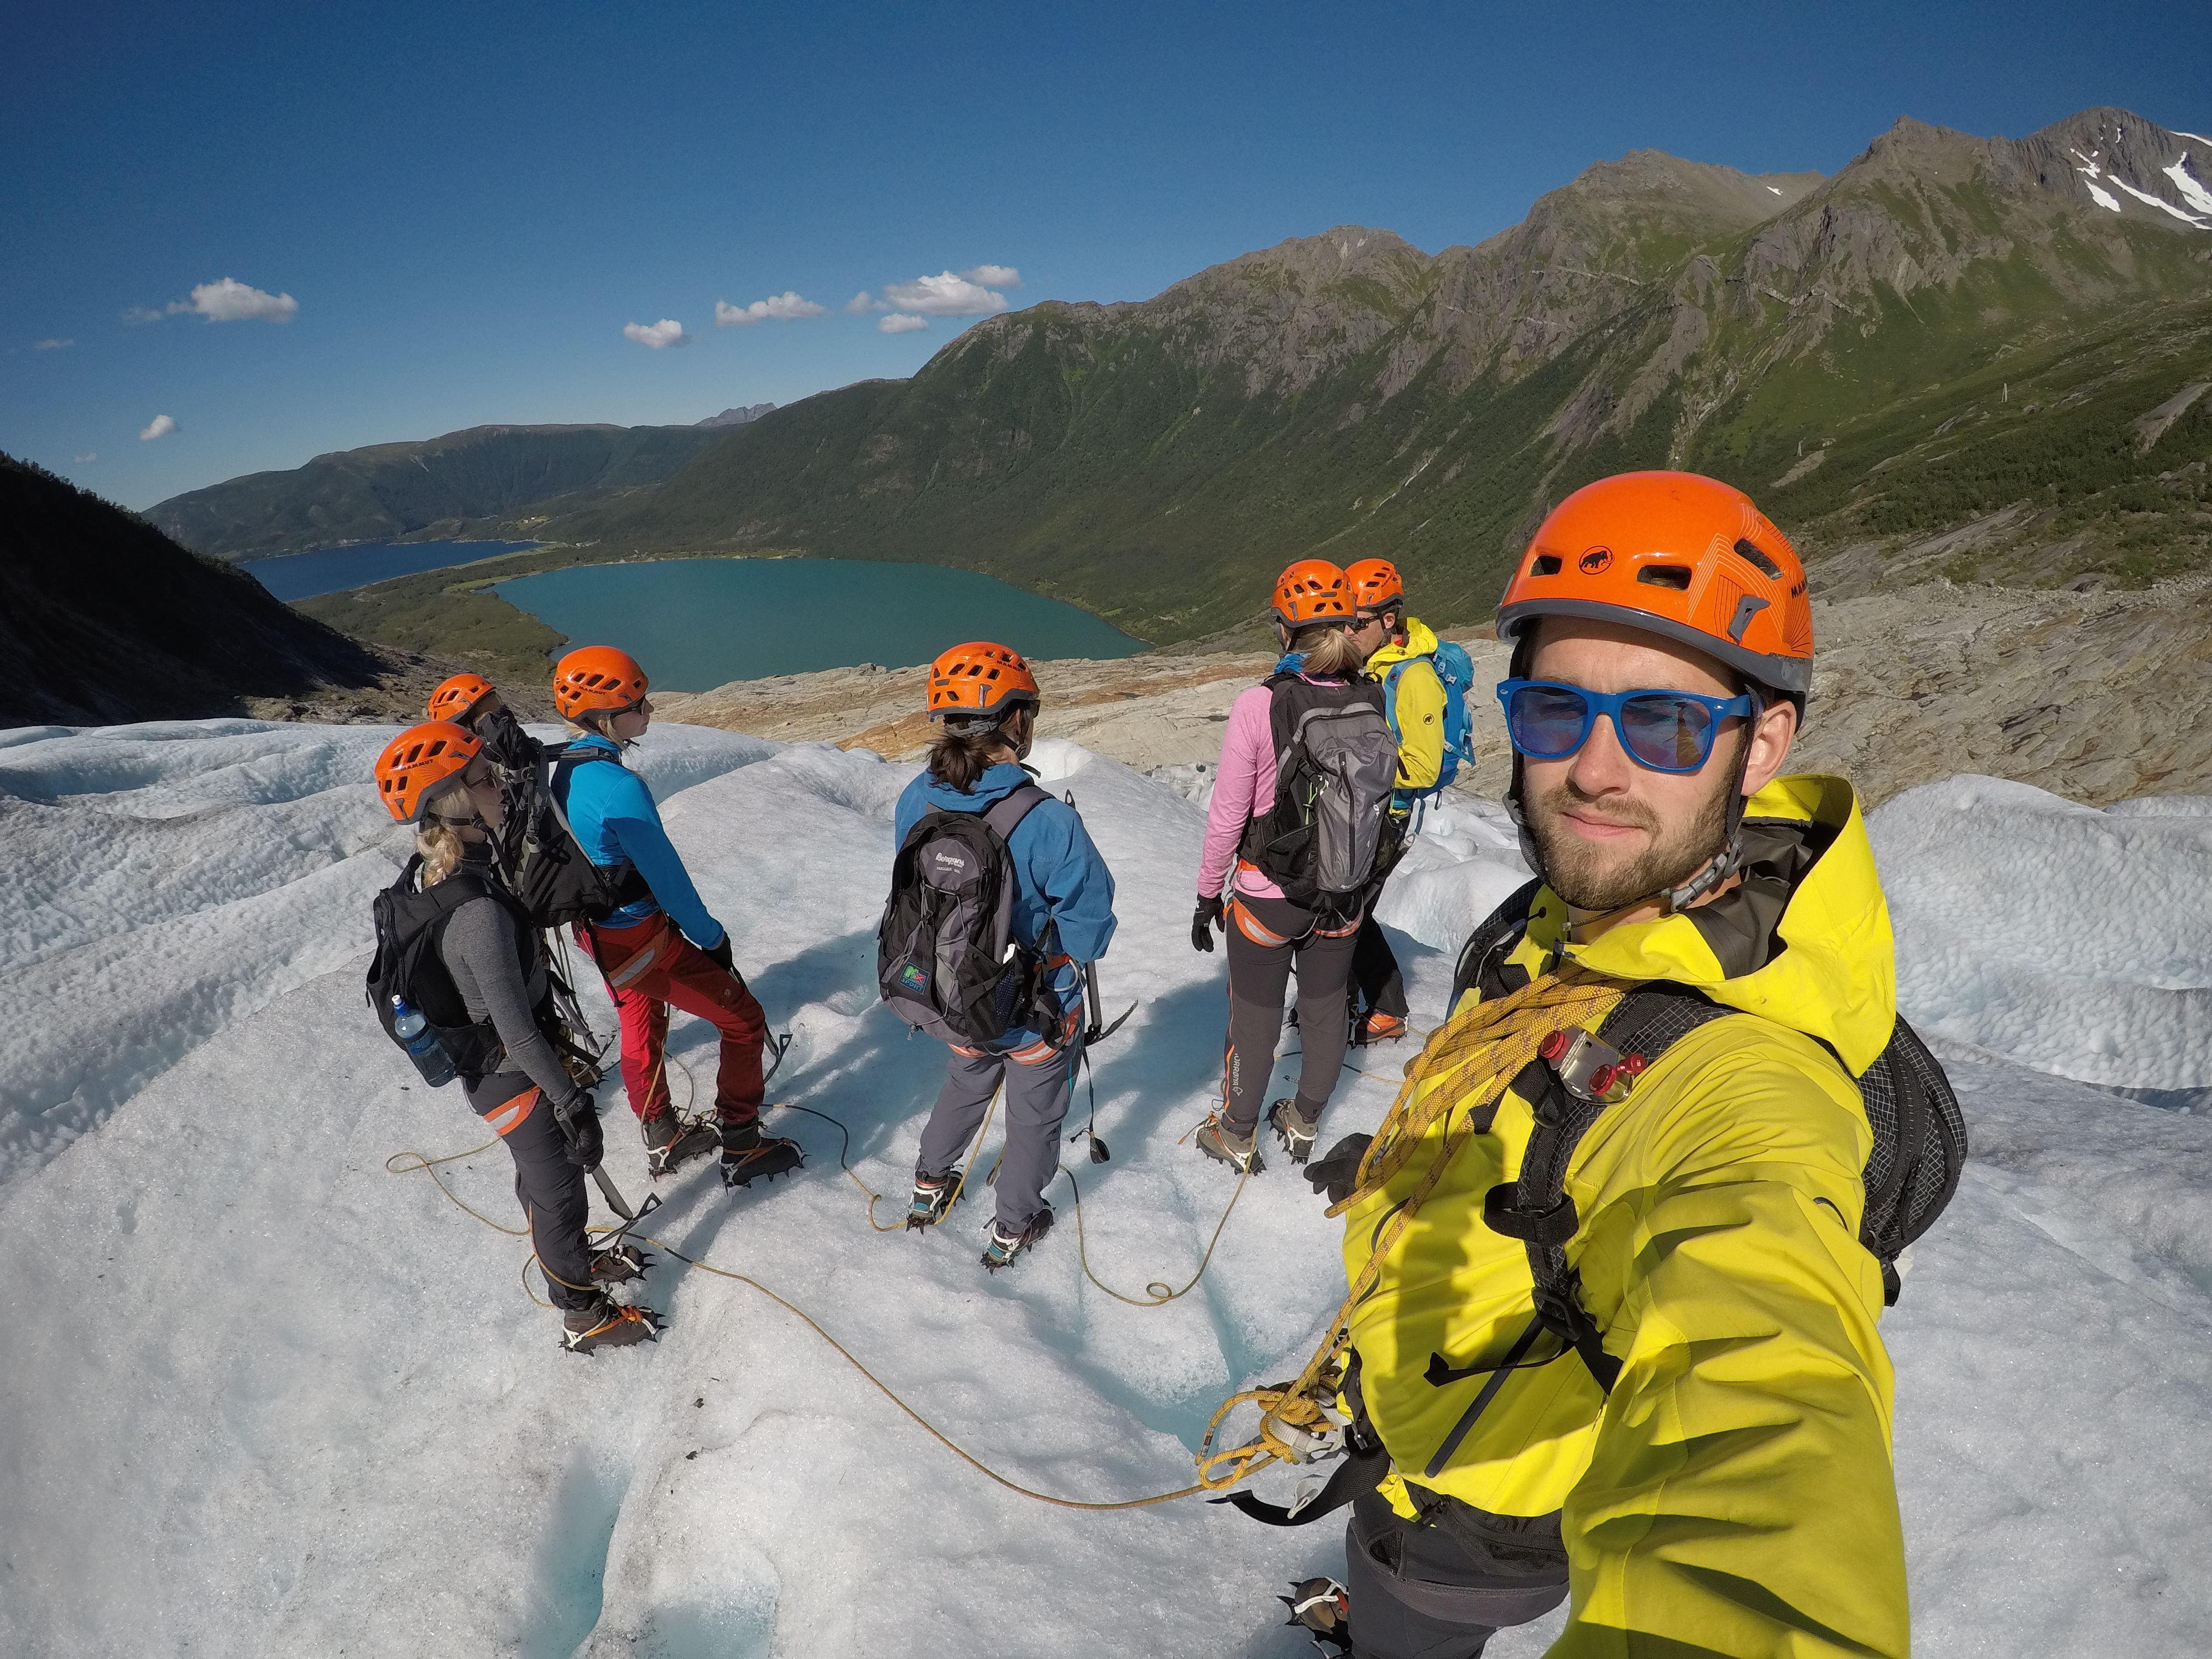 Meløy Adventure, Meløy Adventure